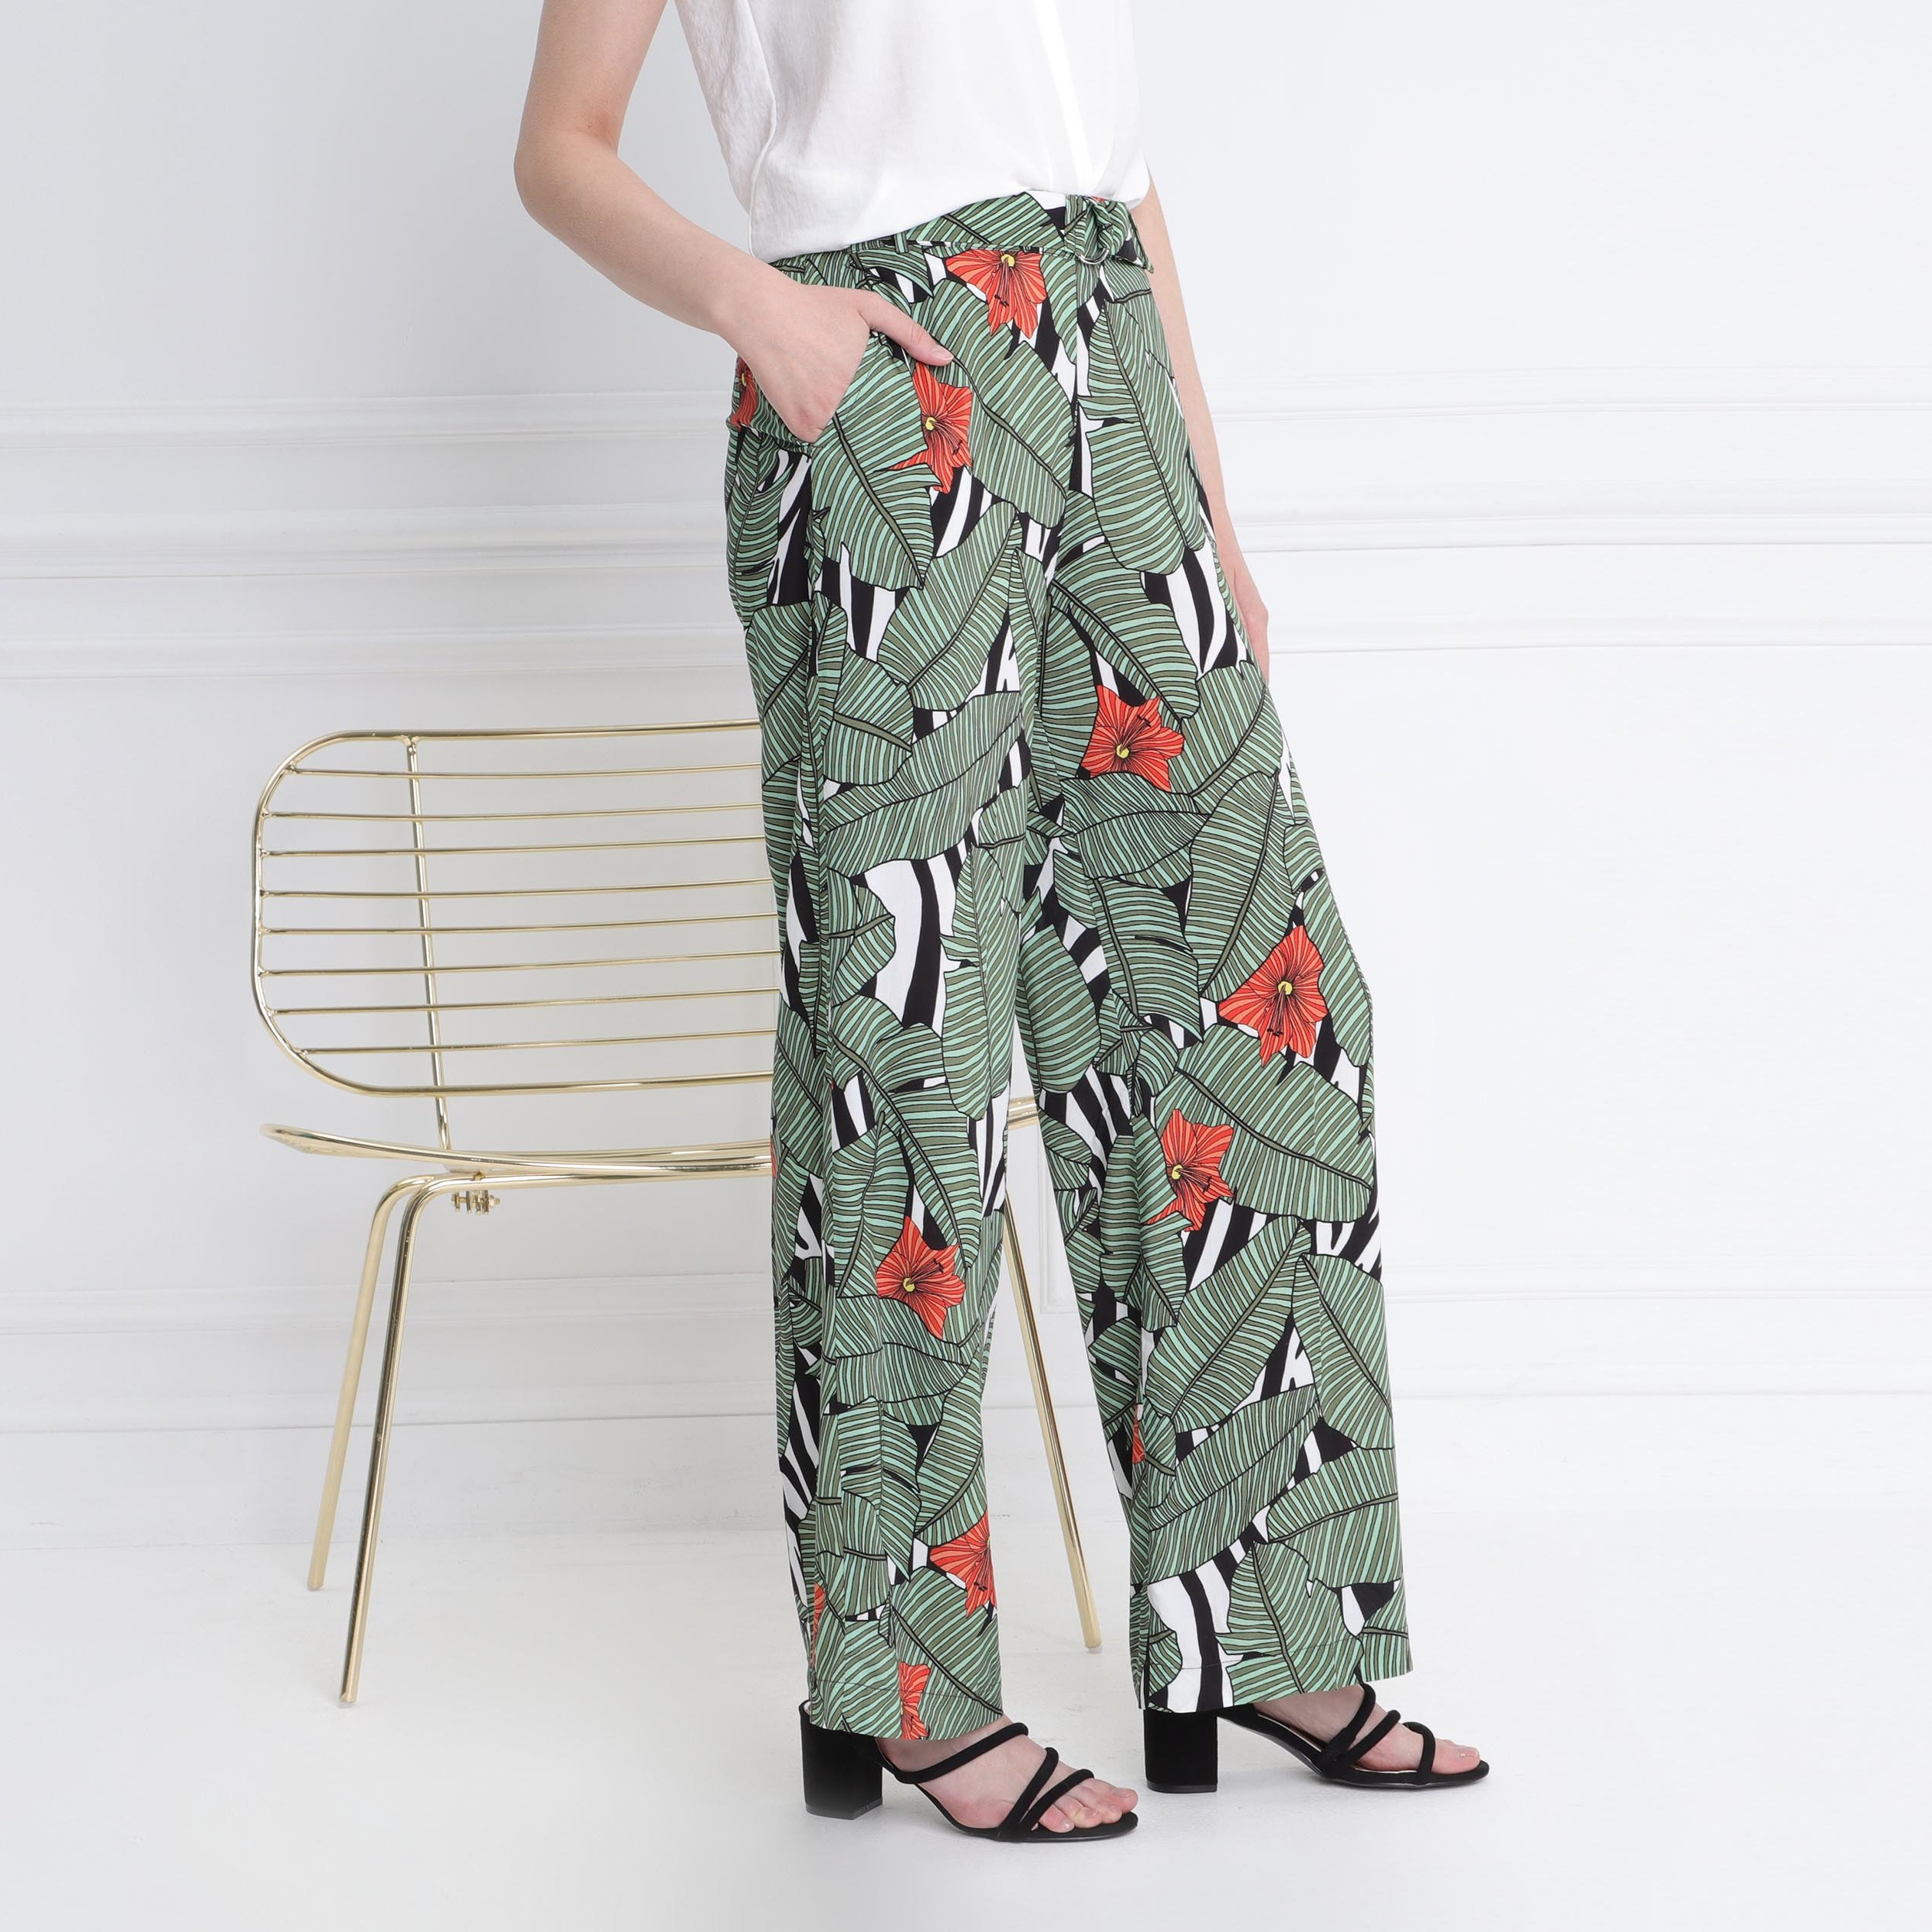 Femme Vert Haute Taille Flou Pantalon YWEID92H